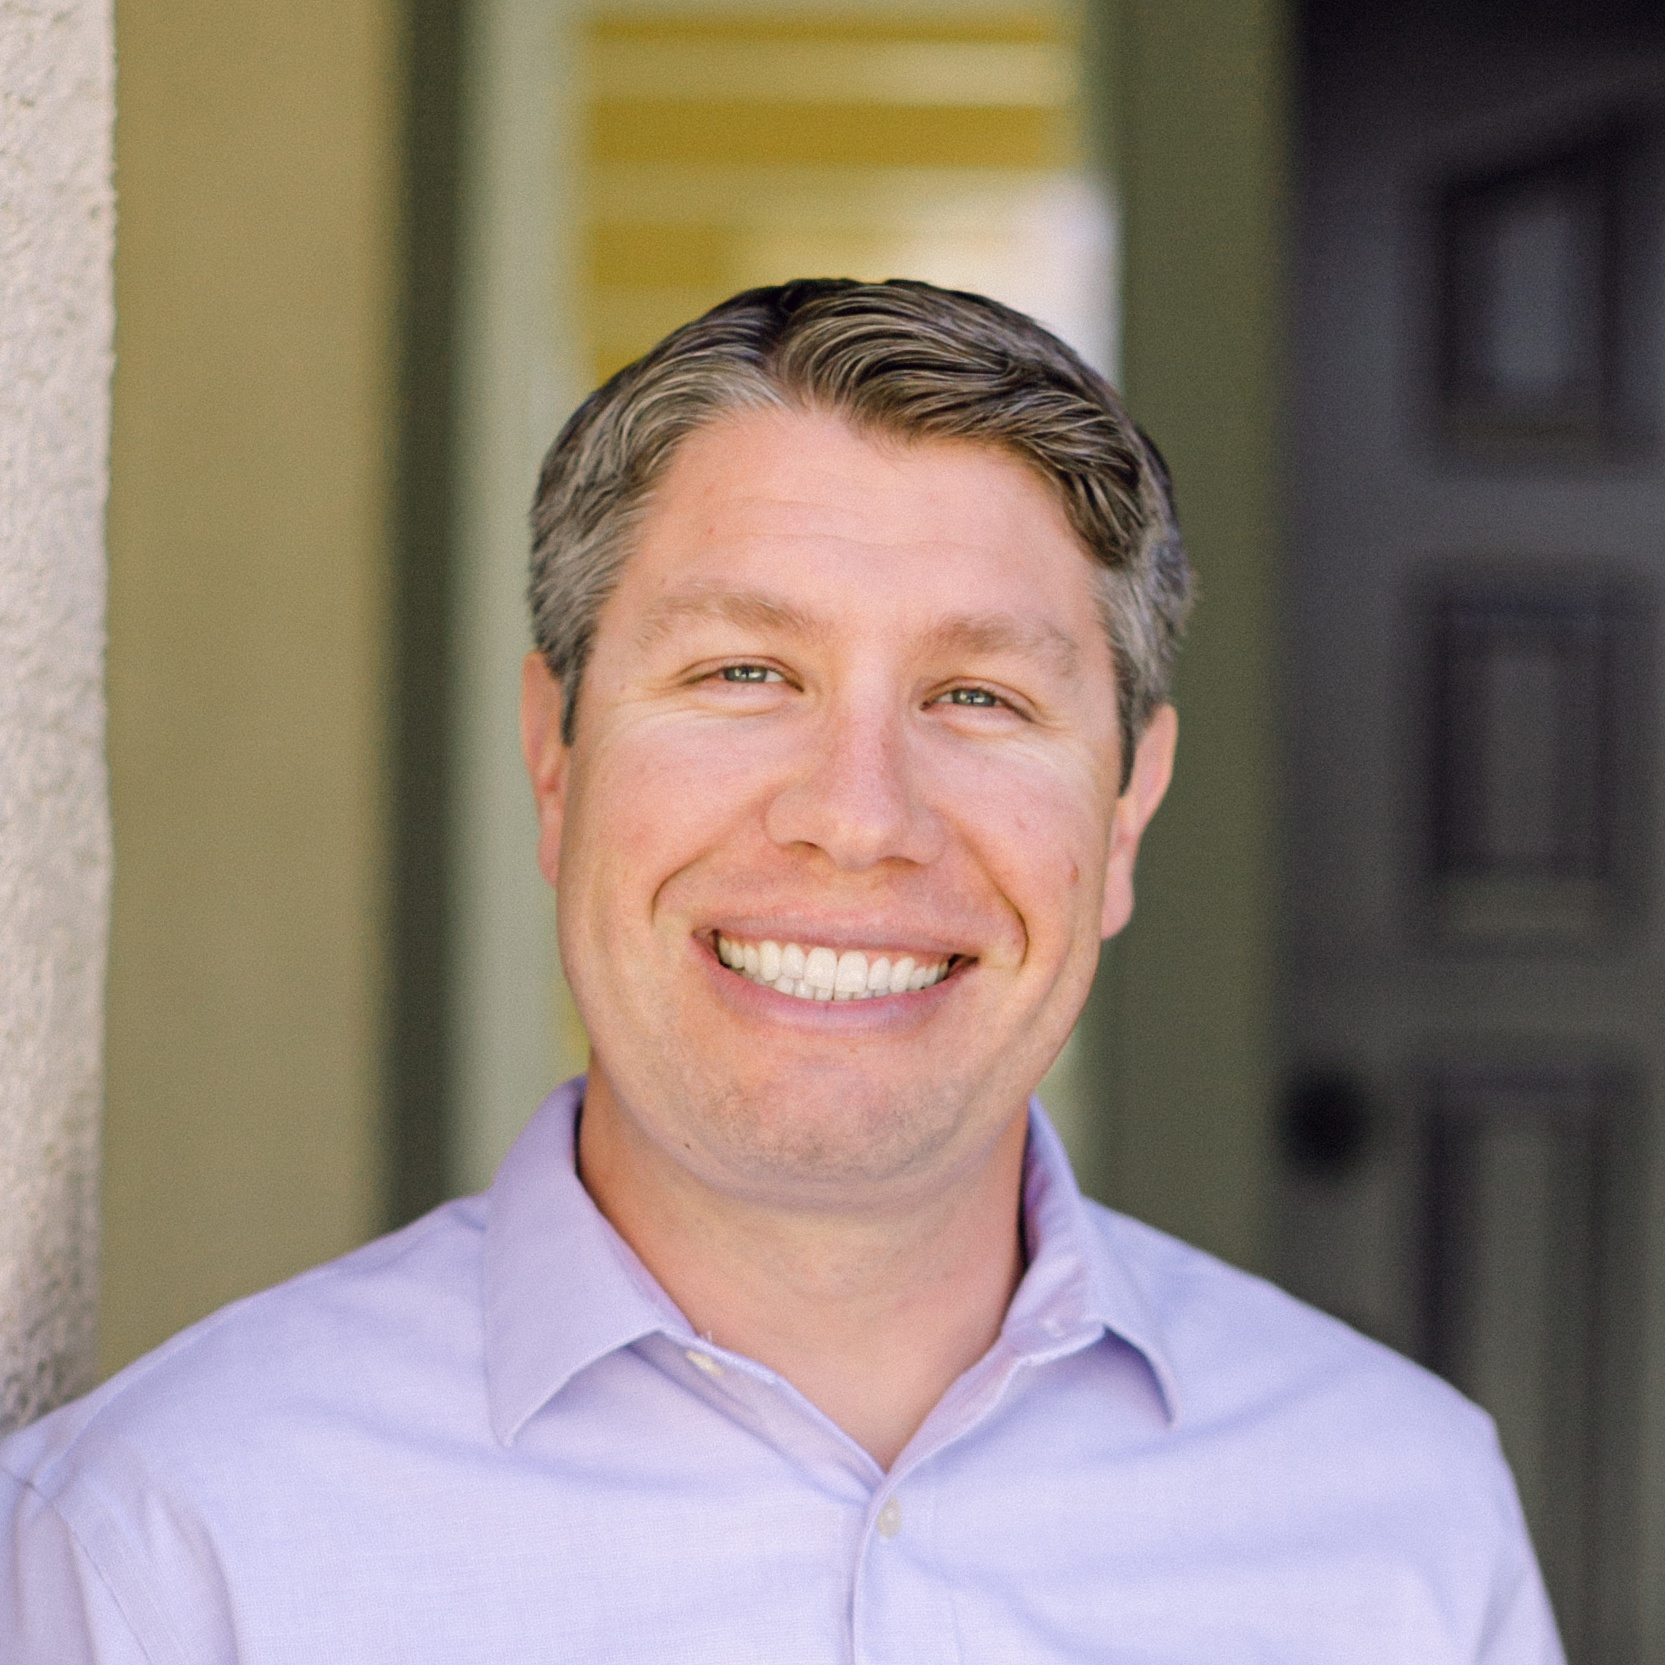 Jeff Rogers portrait photo